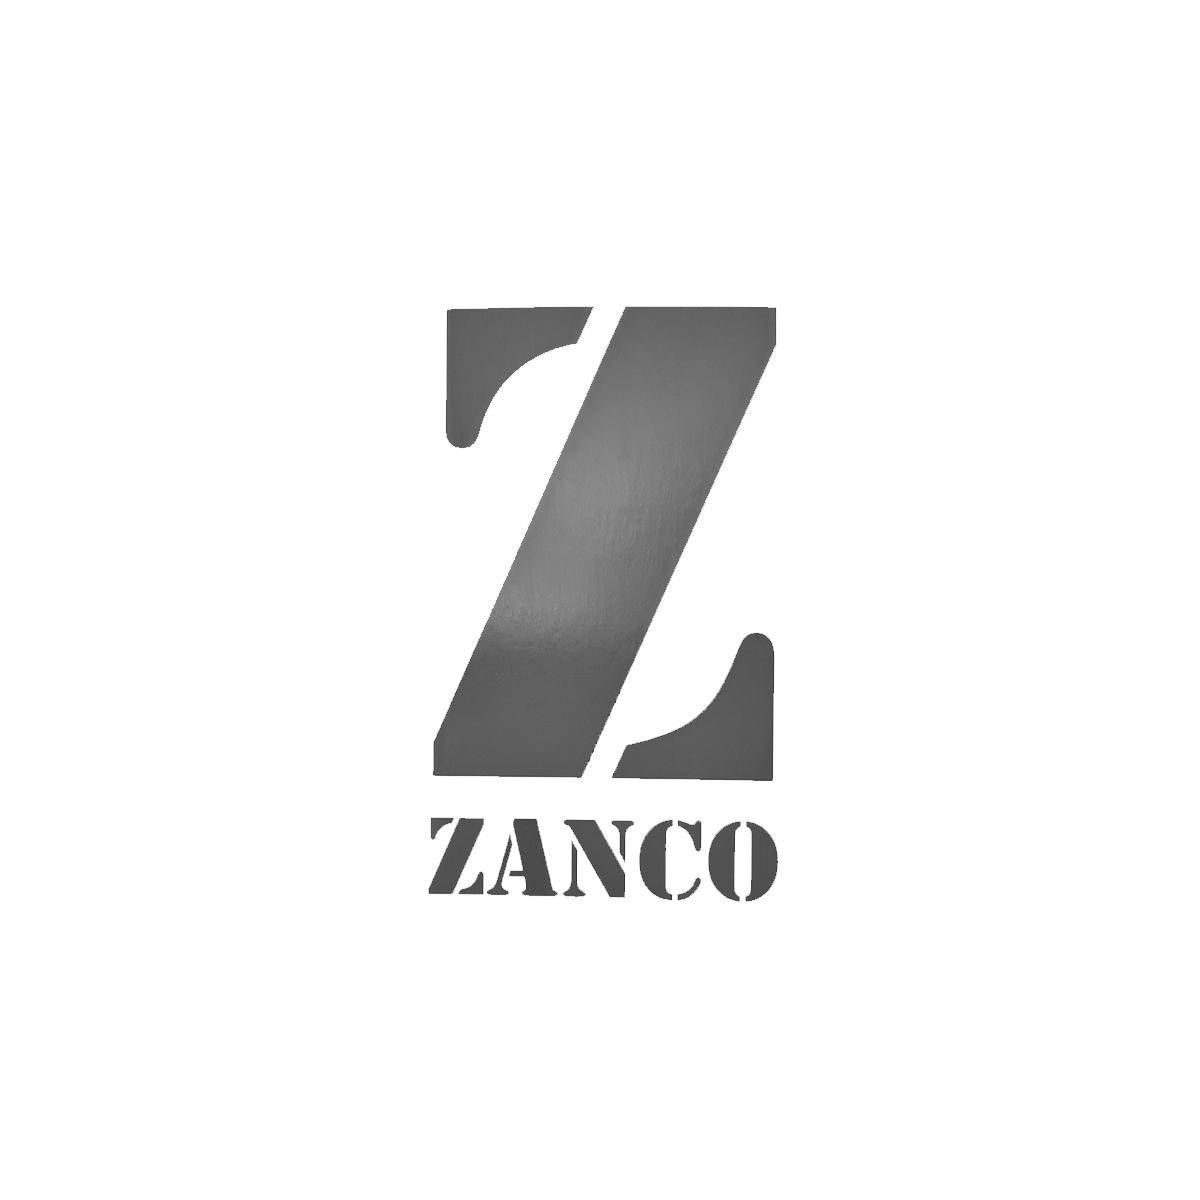 Santiago ( Sancan Shoes slu )